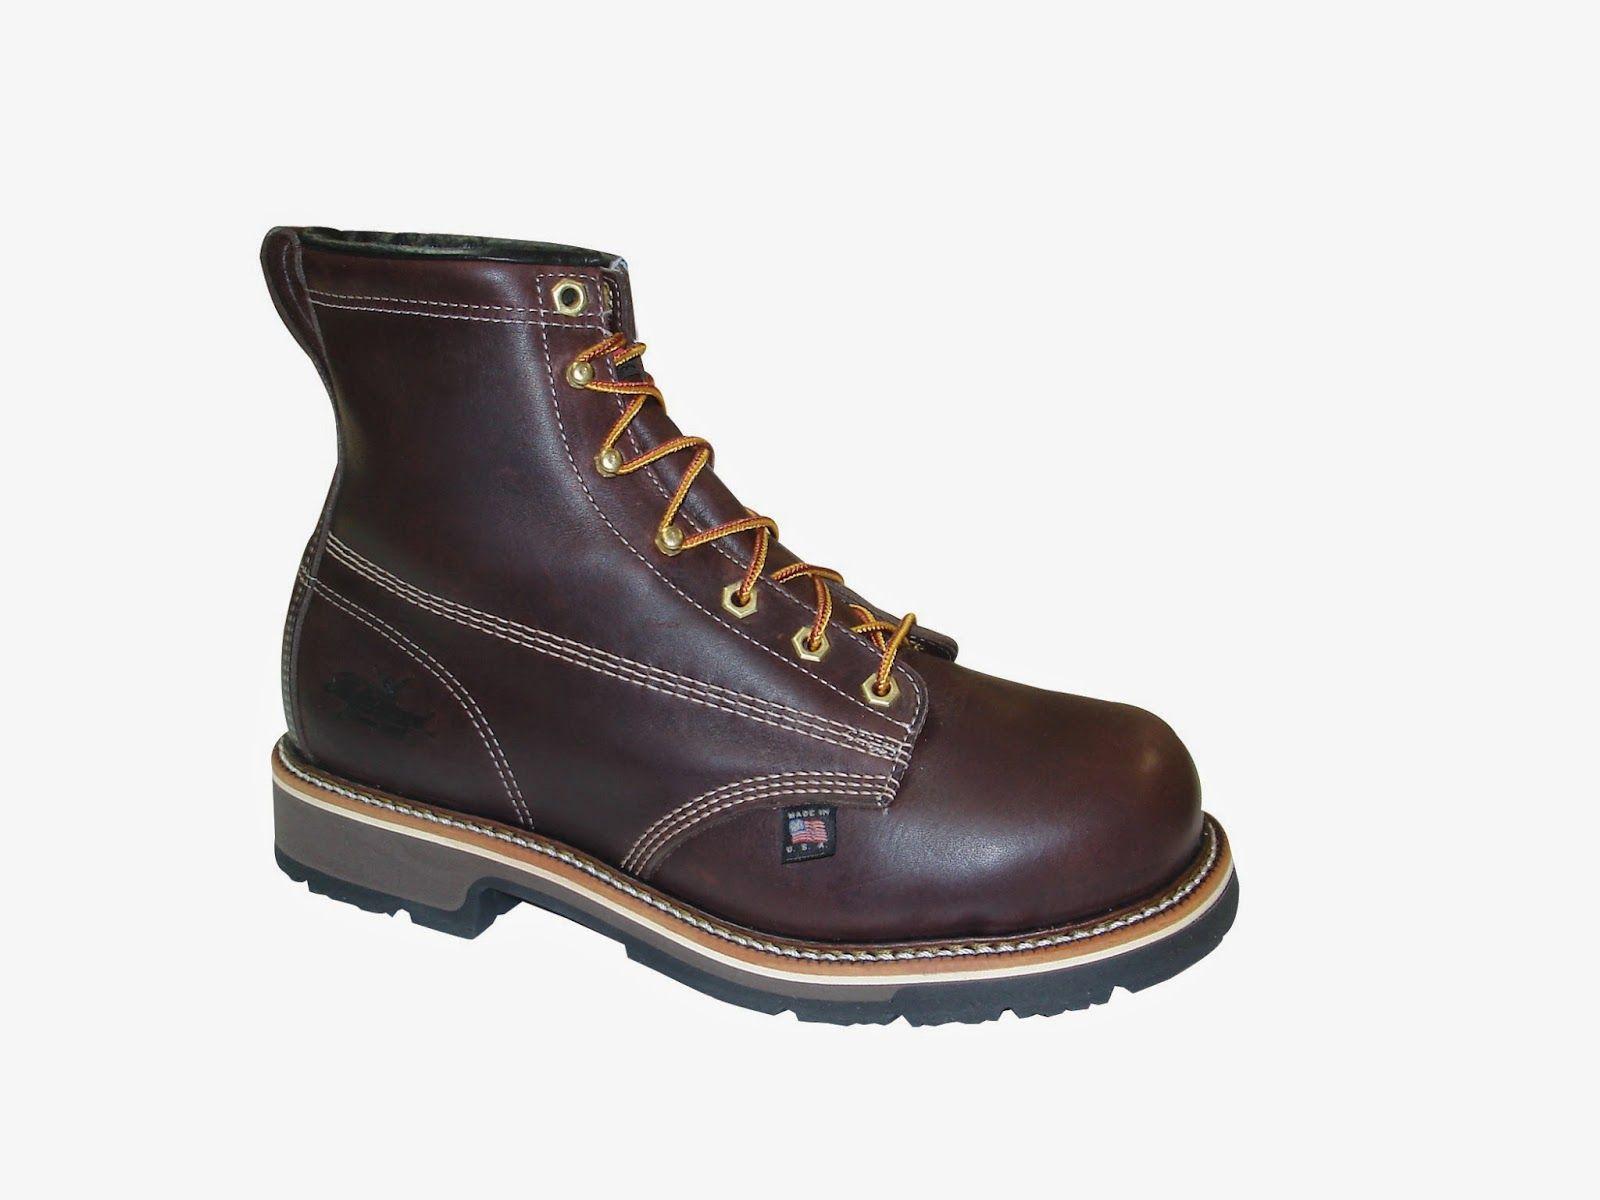 Finally EEEE - 4E Wide Composite Boots